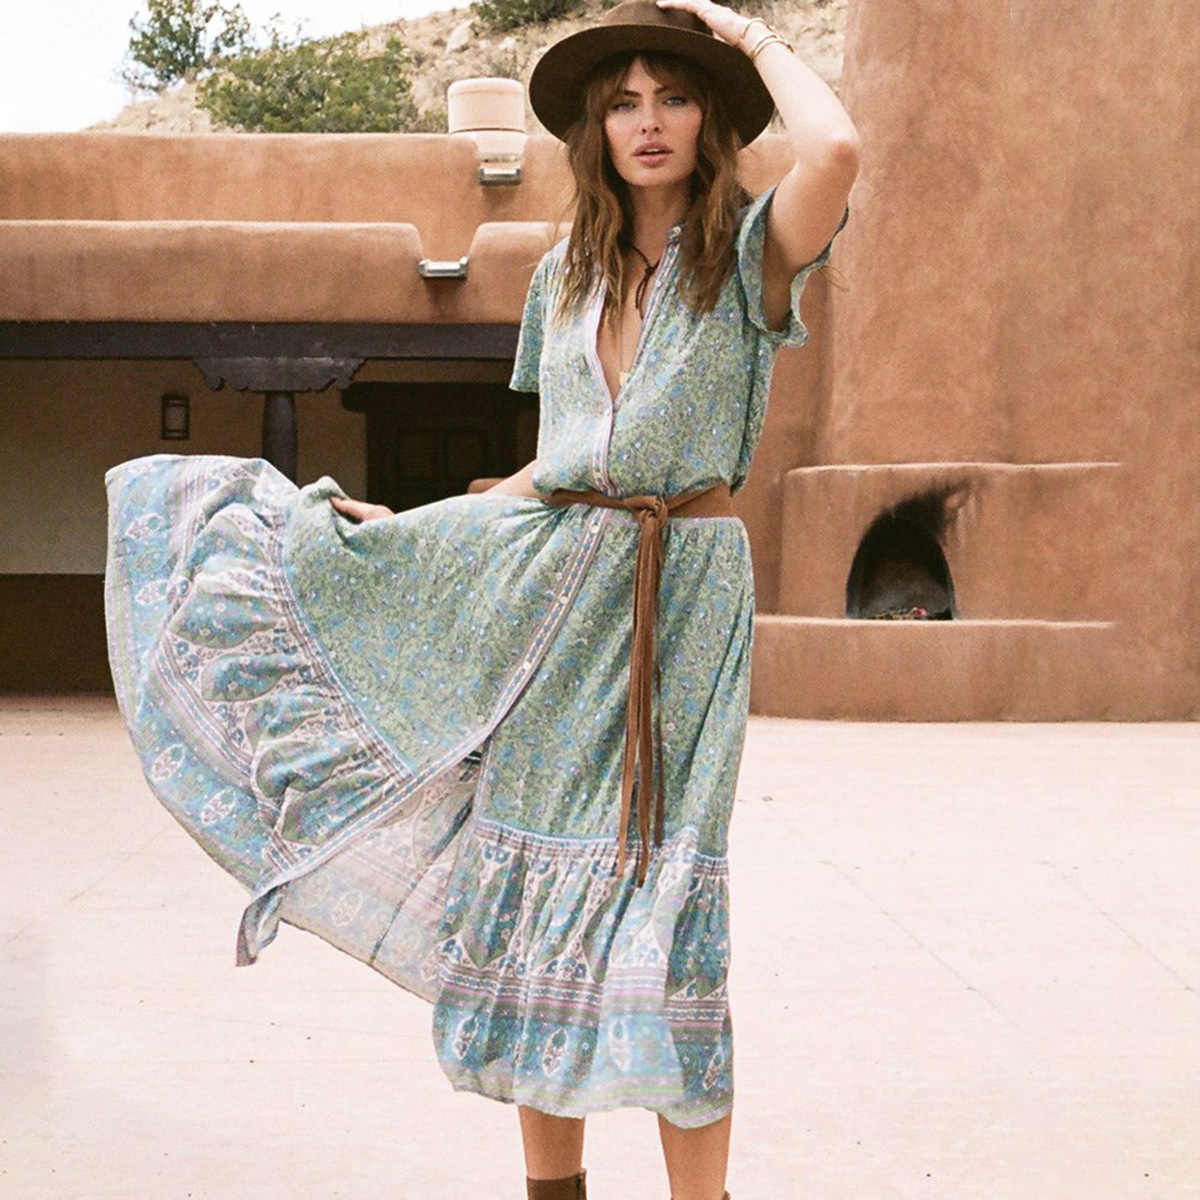 a2dc49fcc5d3 Detail Feedback Questions about Floaty Jasmine Midi Dress Women Summer  Short Sleeve V neck Button Down Sexy Dresses Ladies Boho Gypsy Beach Hippie  Long ...